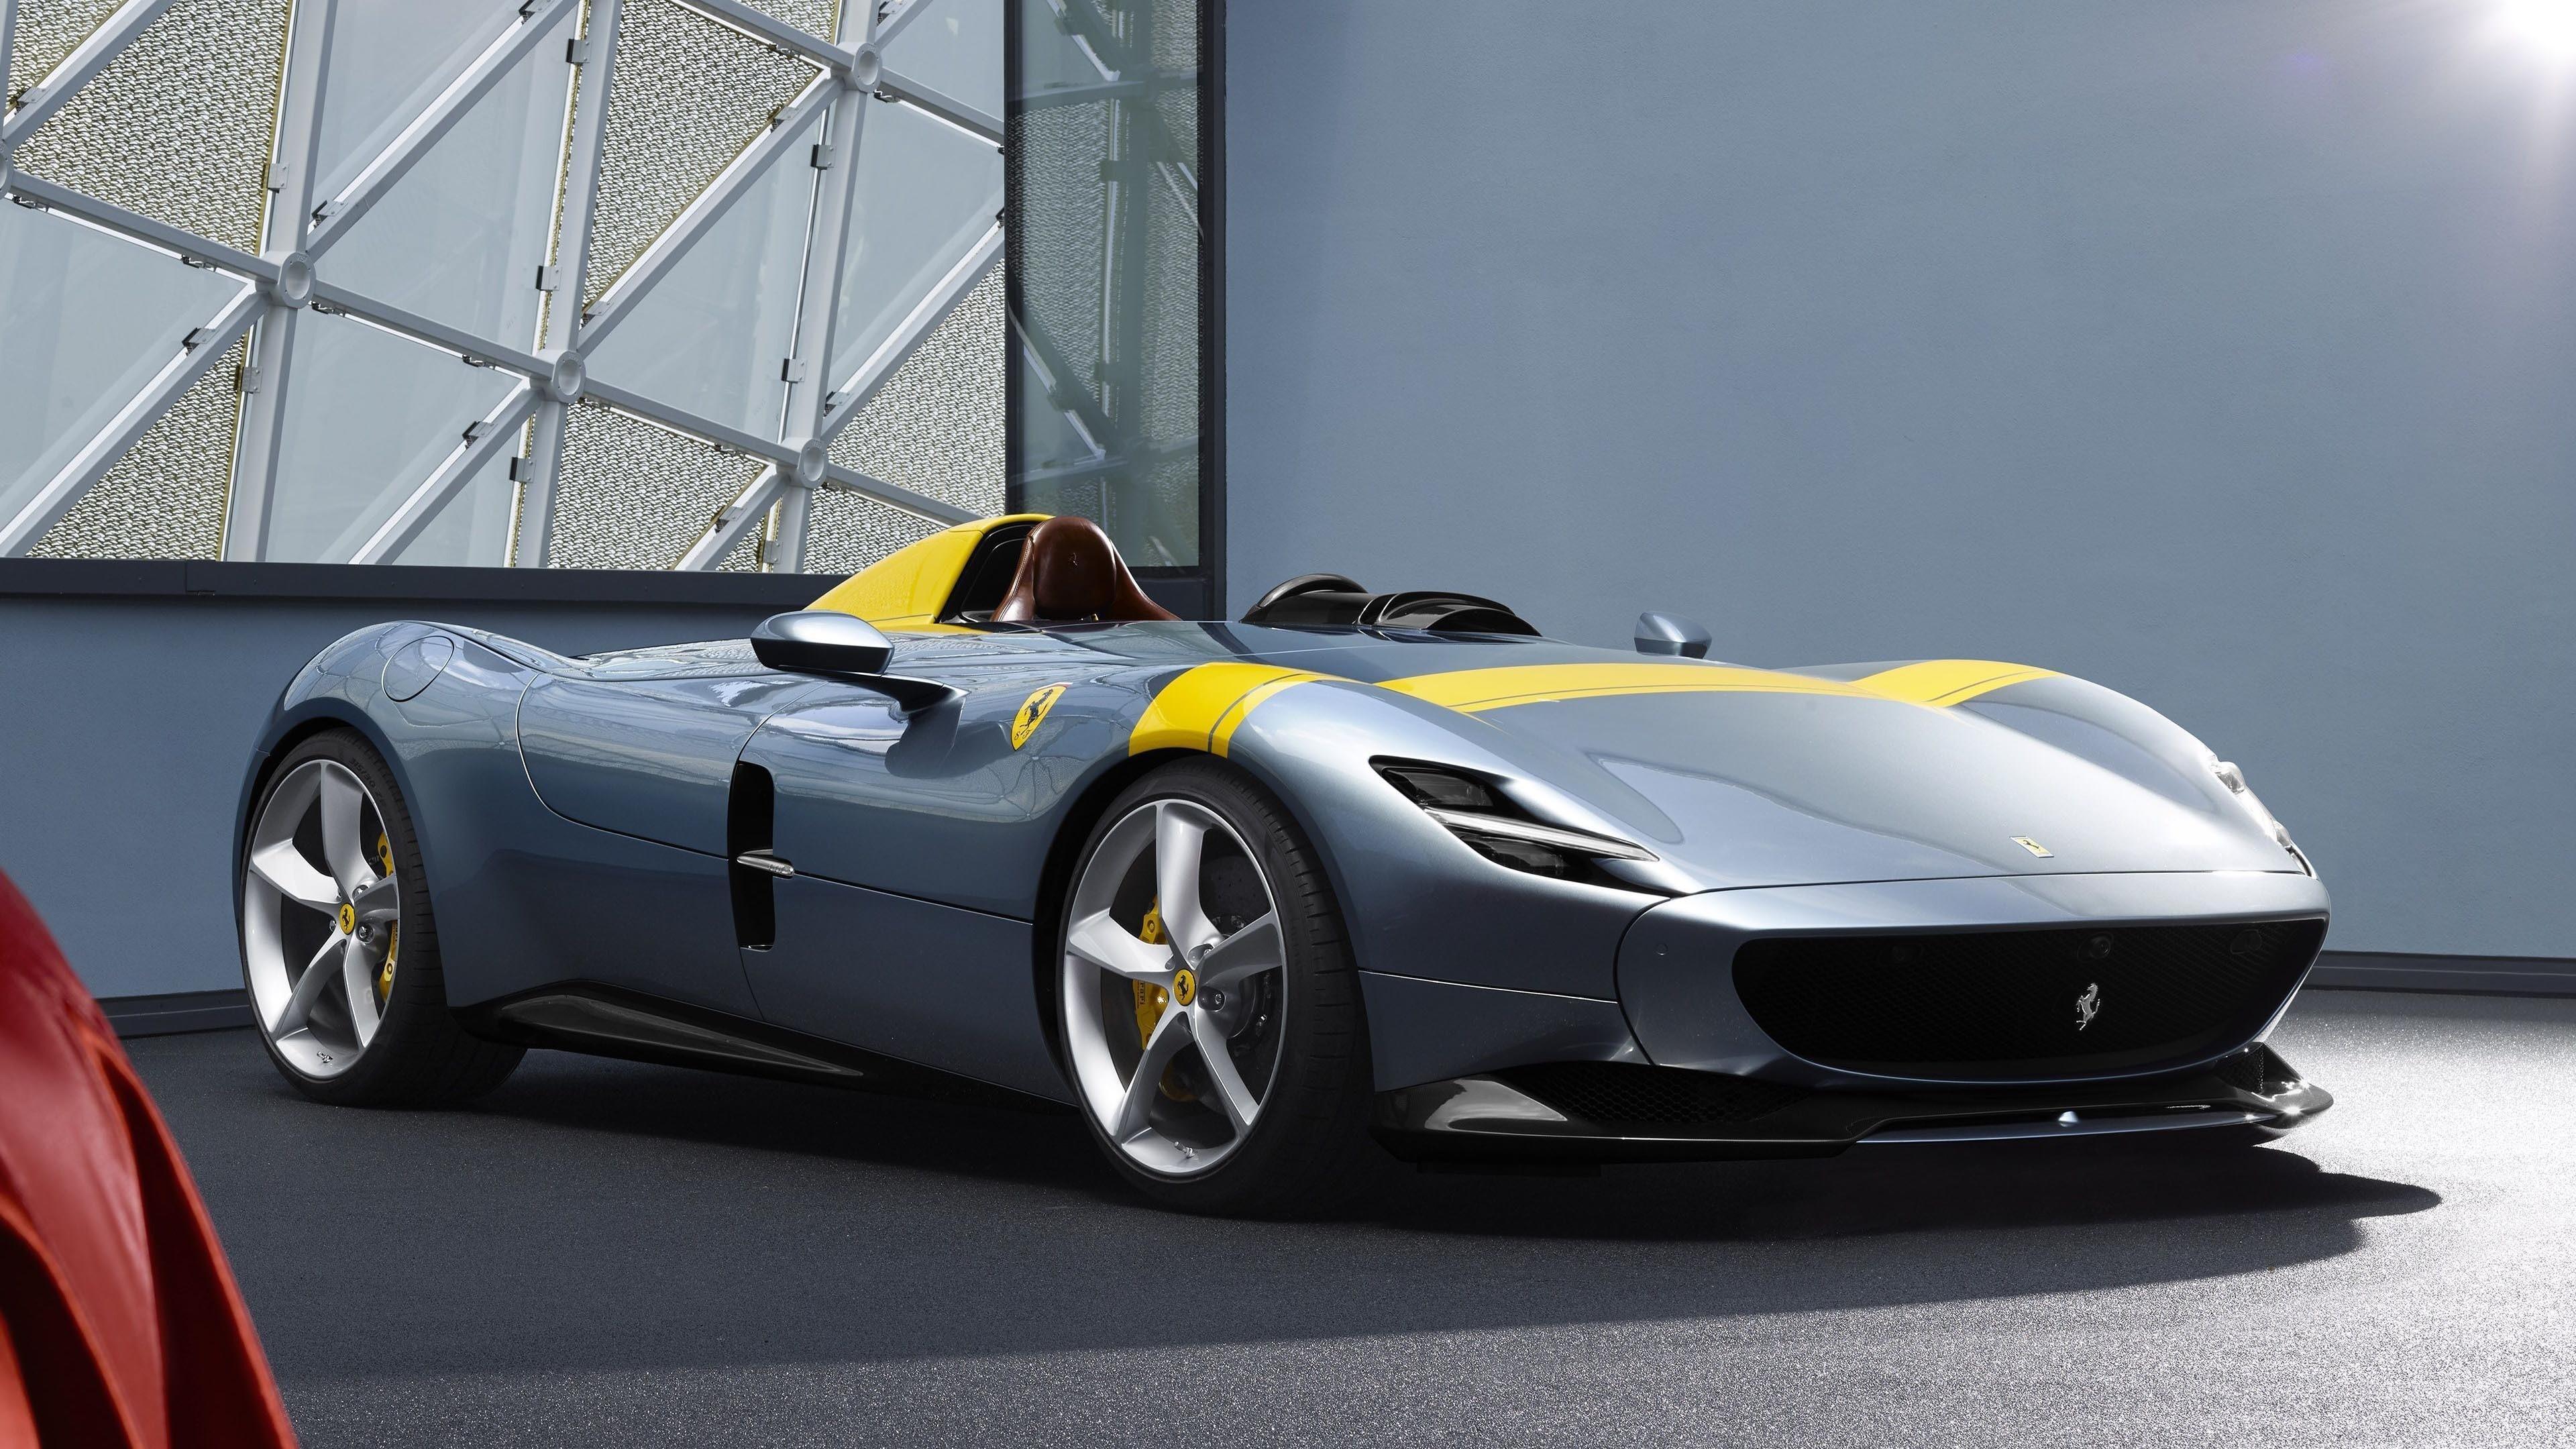 BMW Mountain View >> 4K Wallpaper of Ferrari Monza SP1 Car | HD Wallpapers